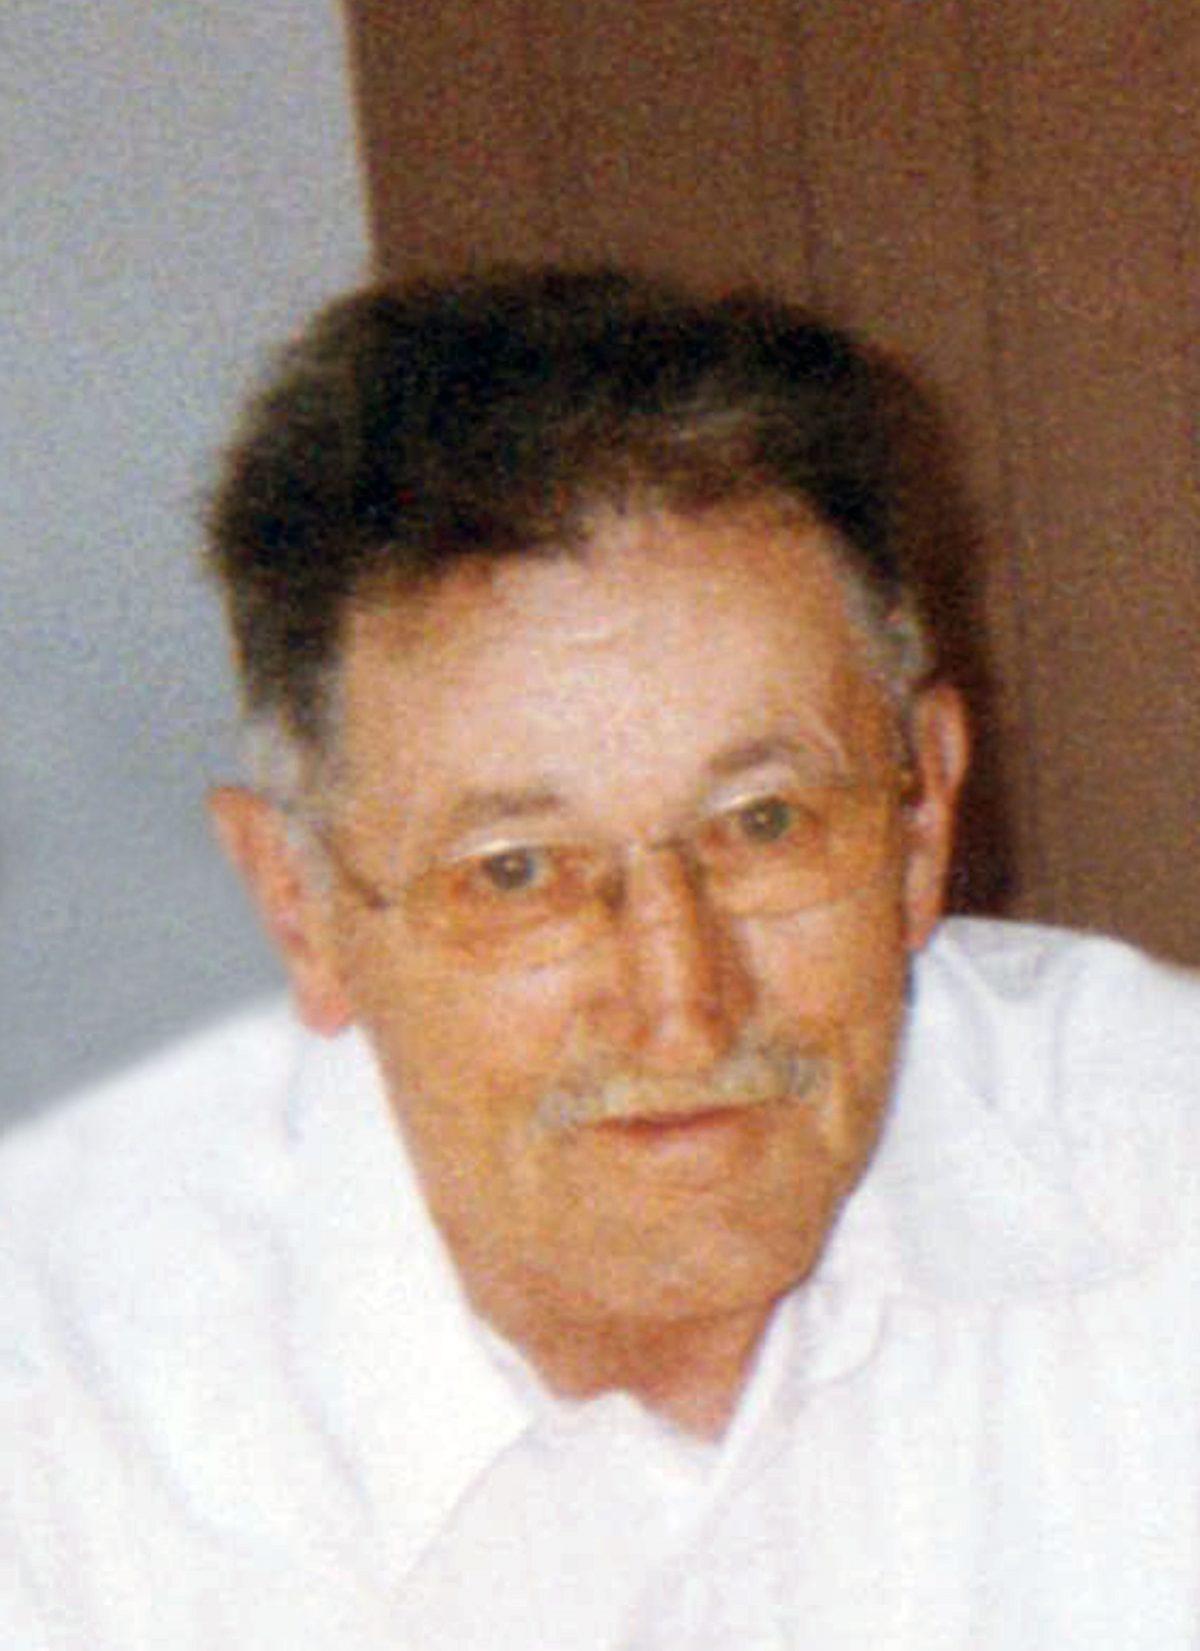 Marcel Huls